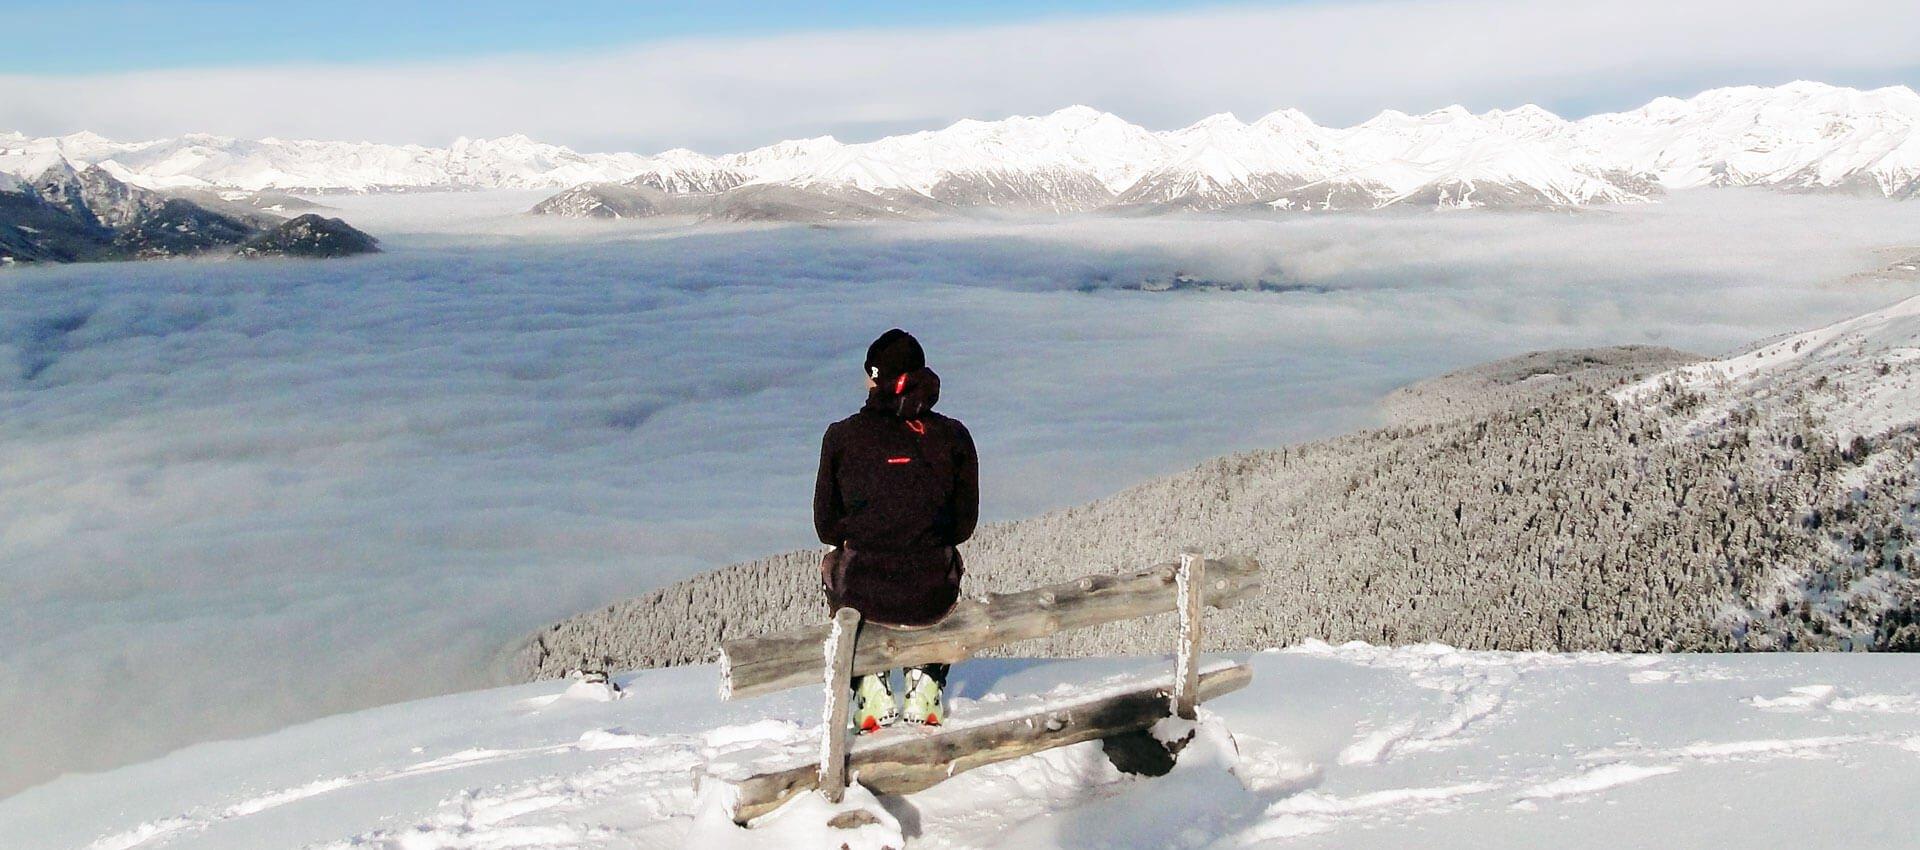 winterferien-dolomiten-suedtirol